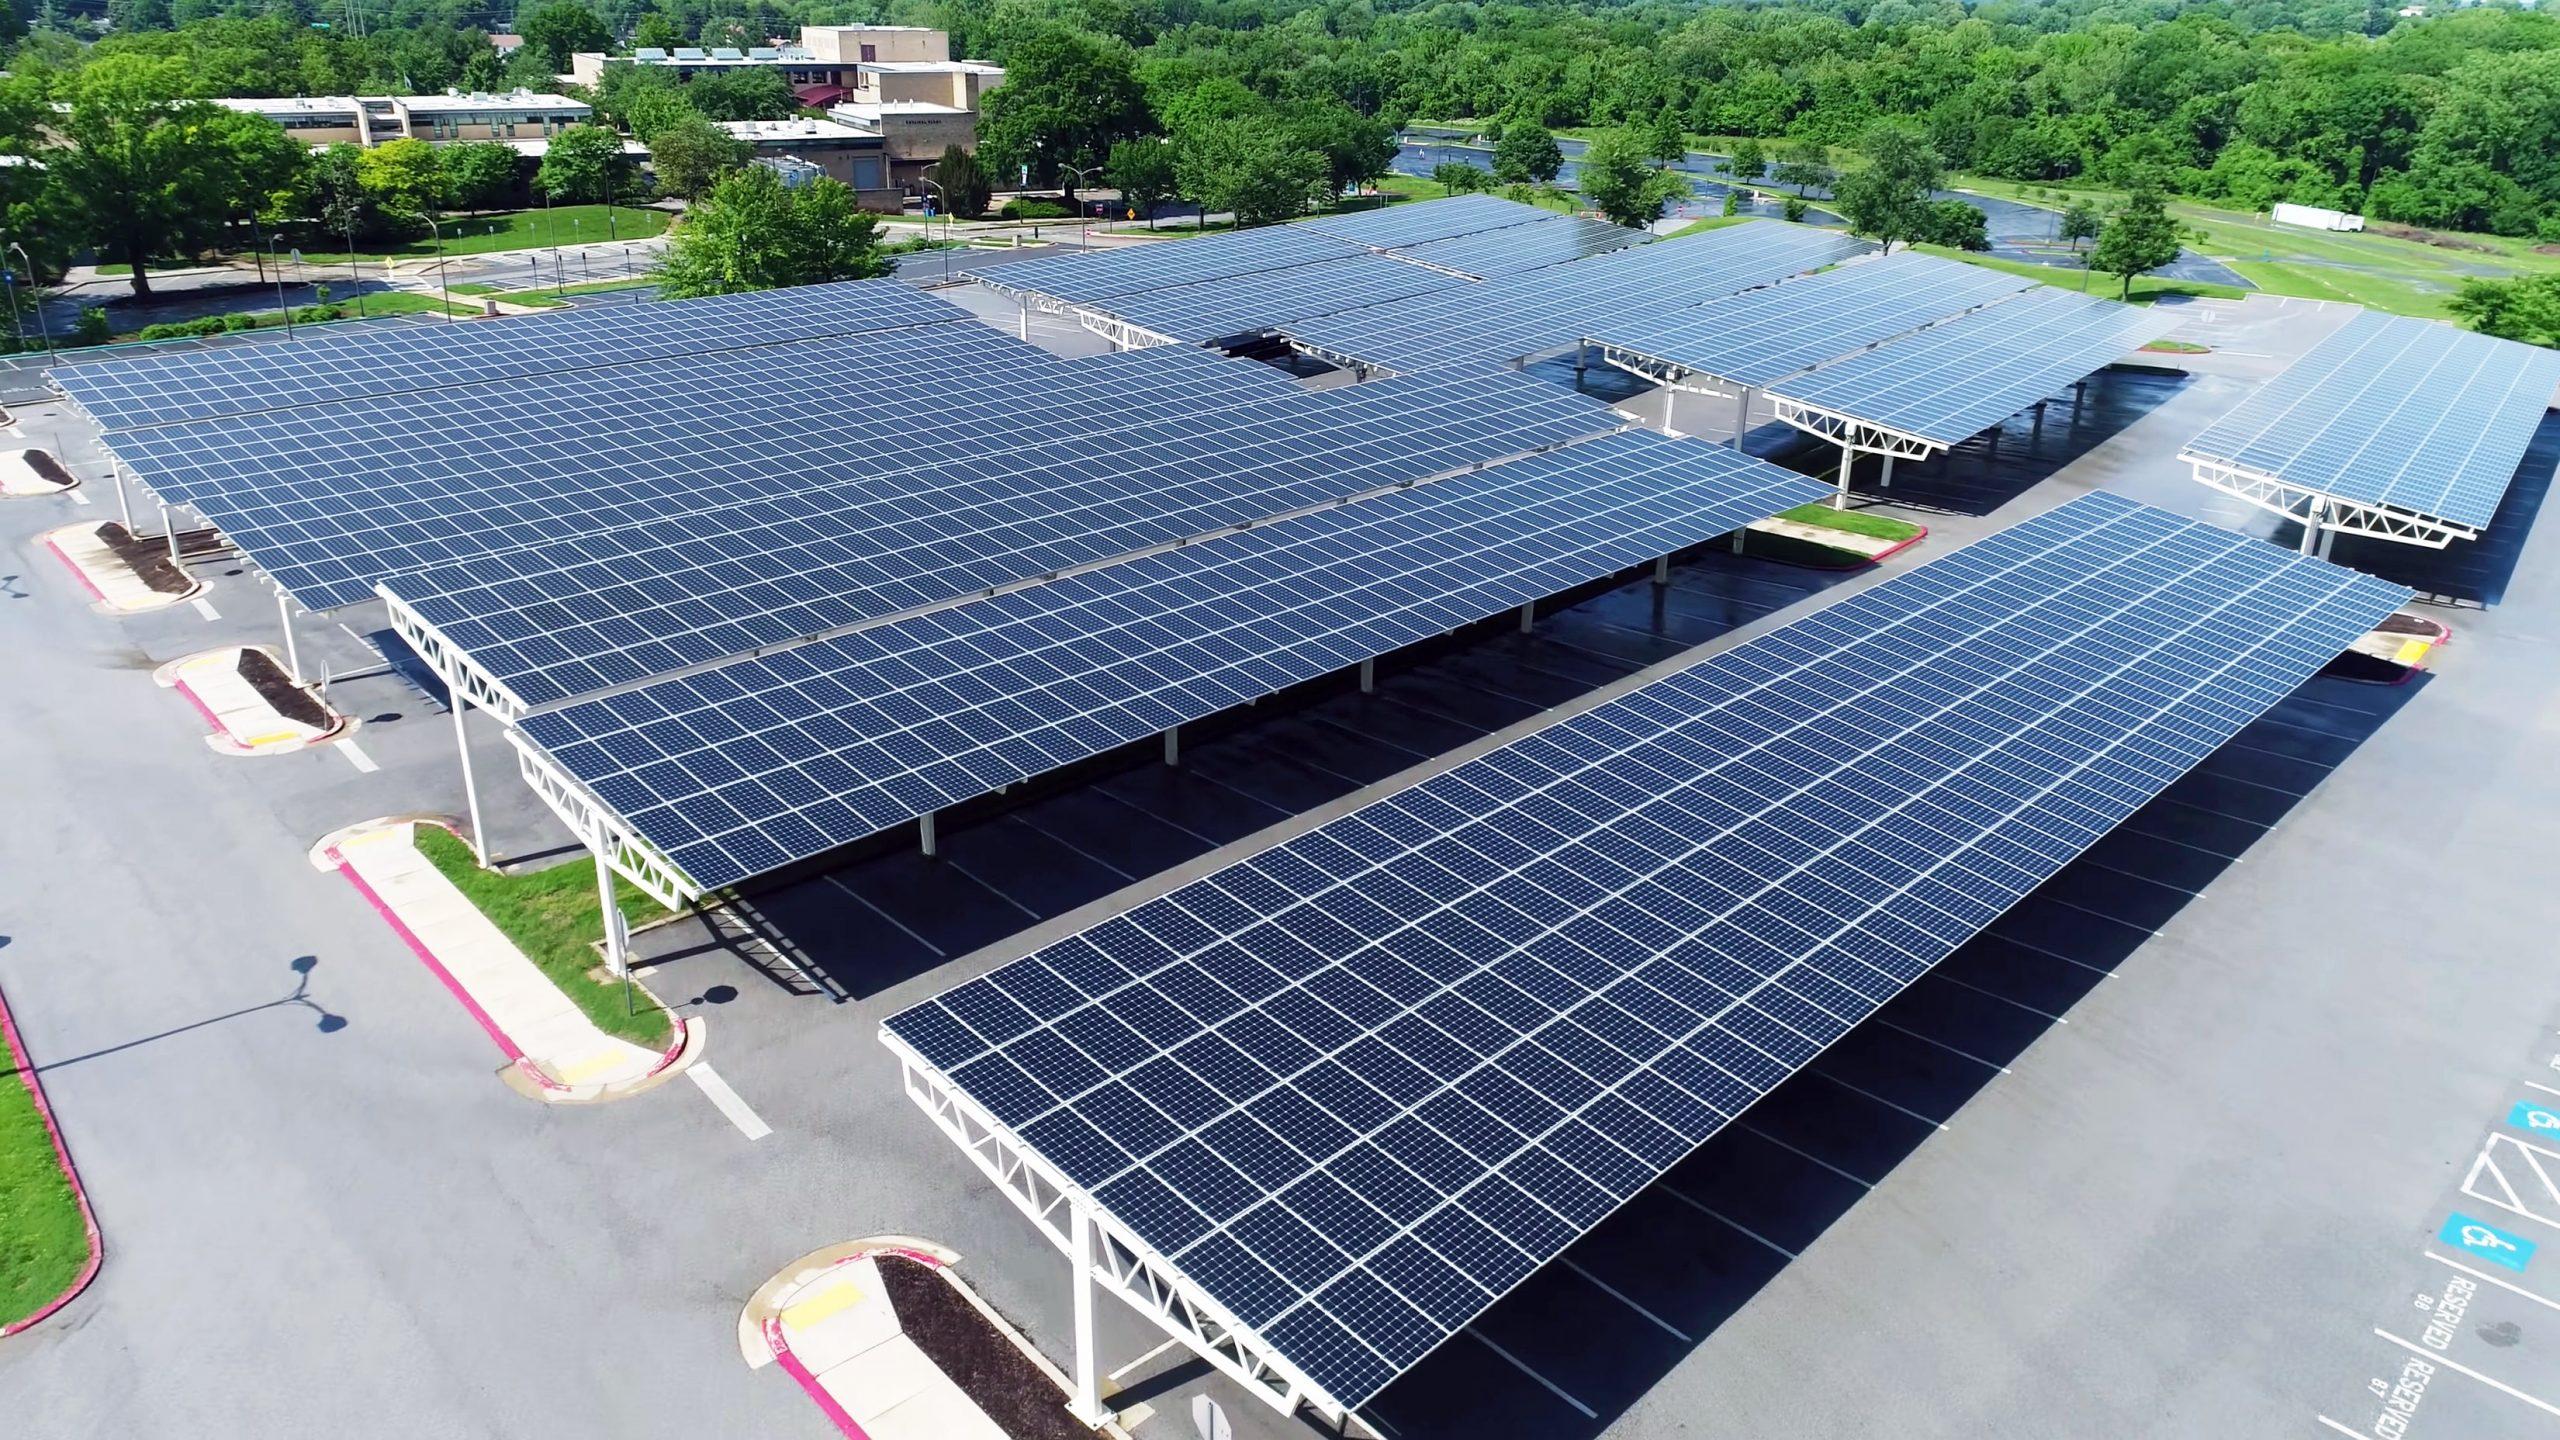 solar panels over a parking lot